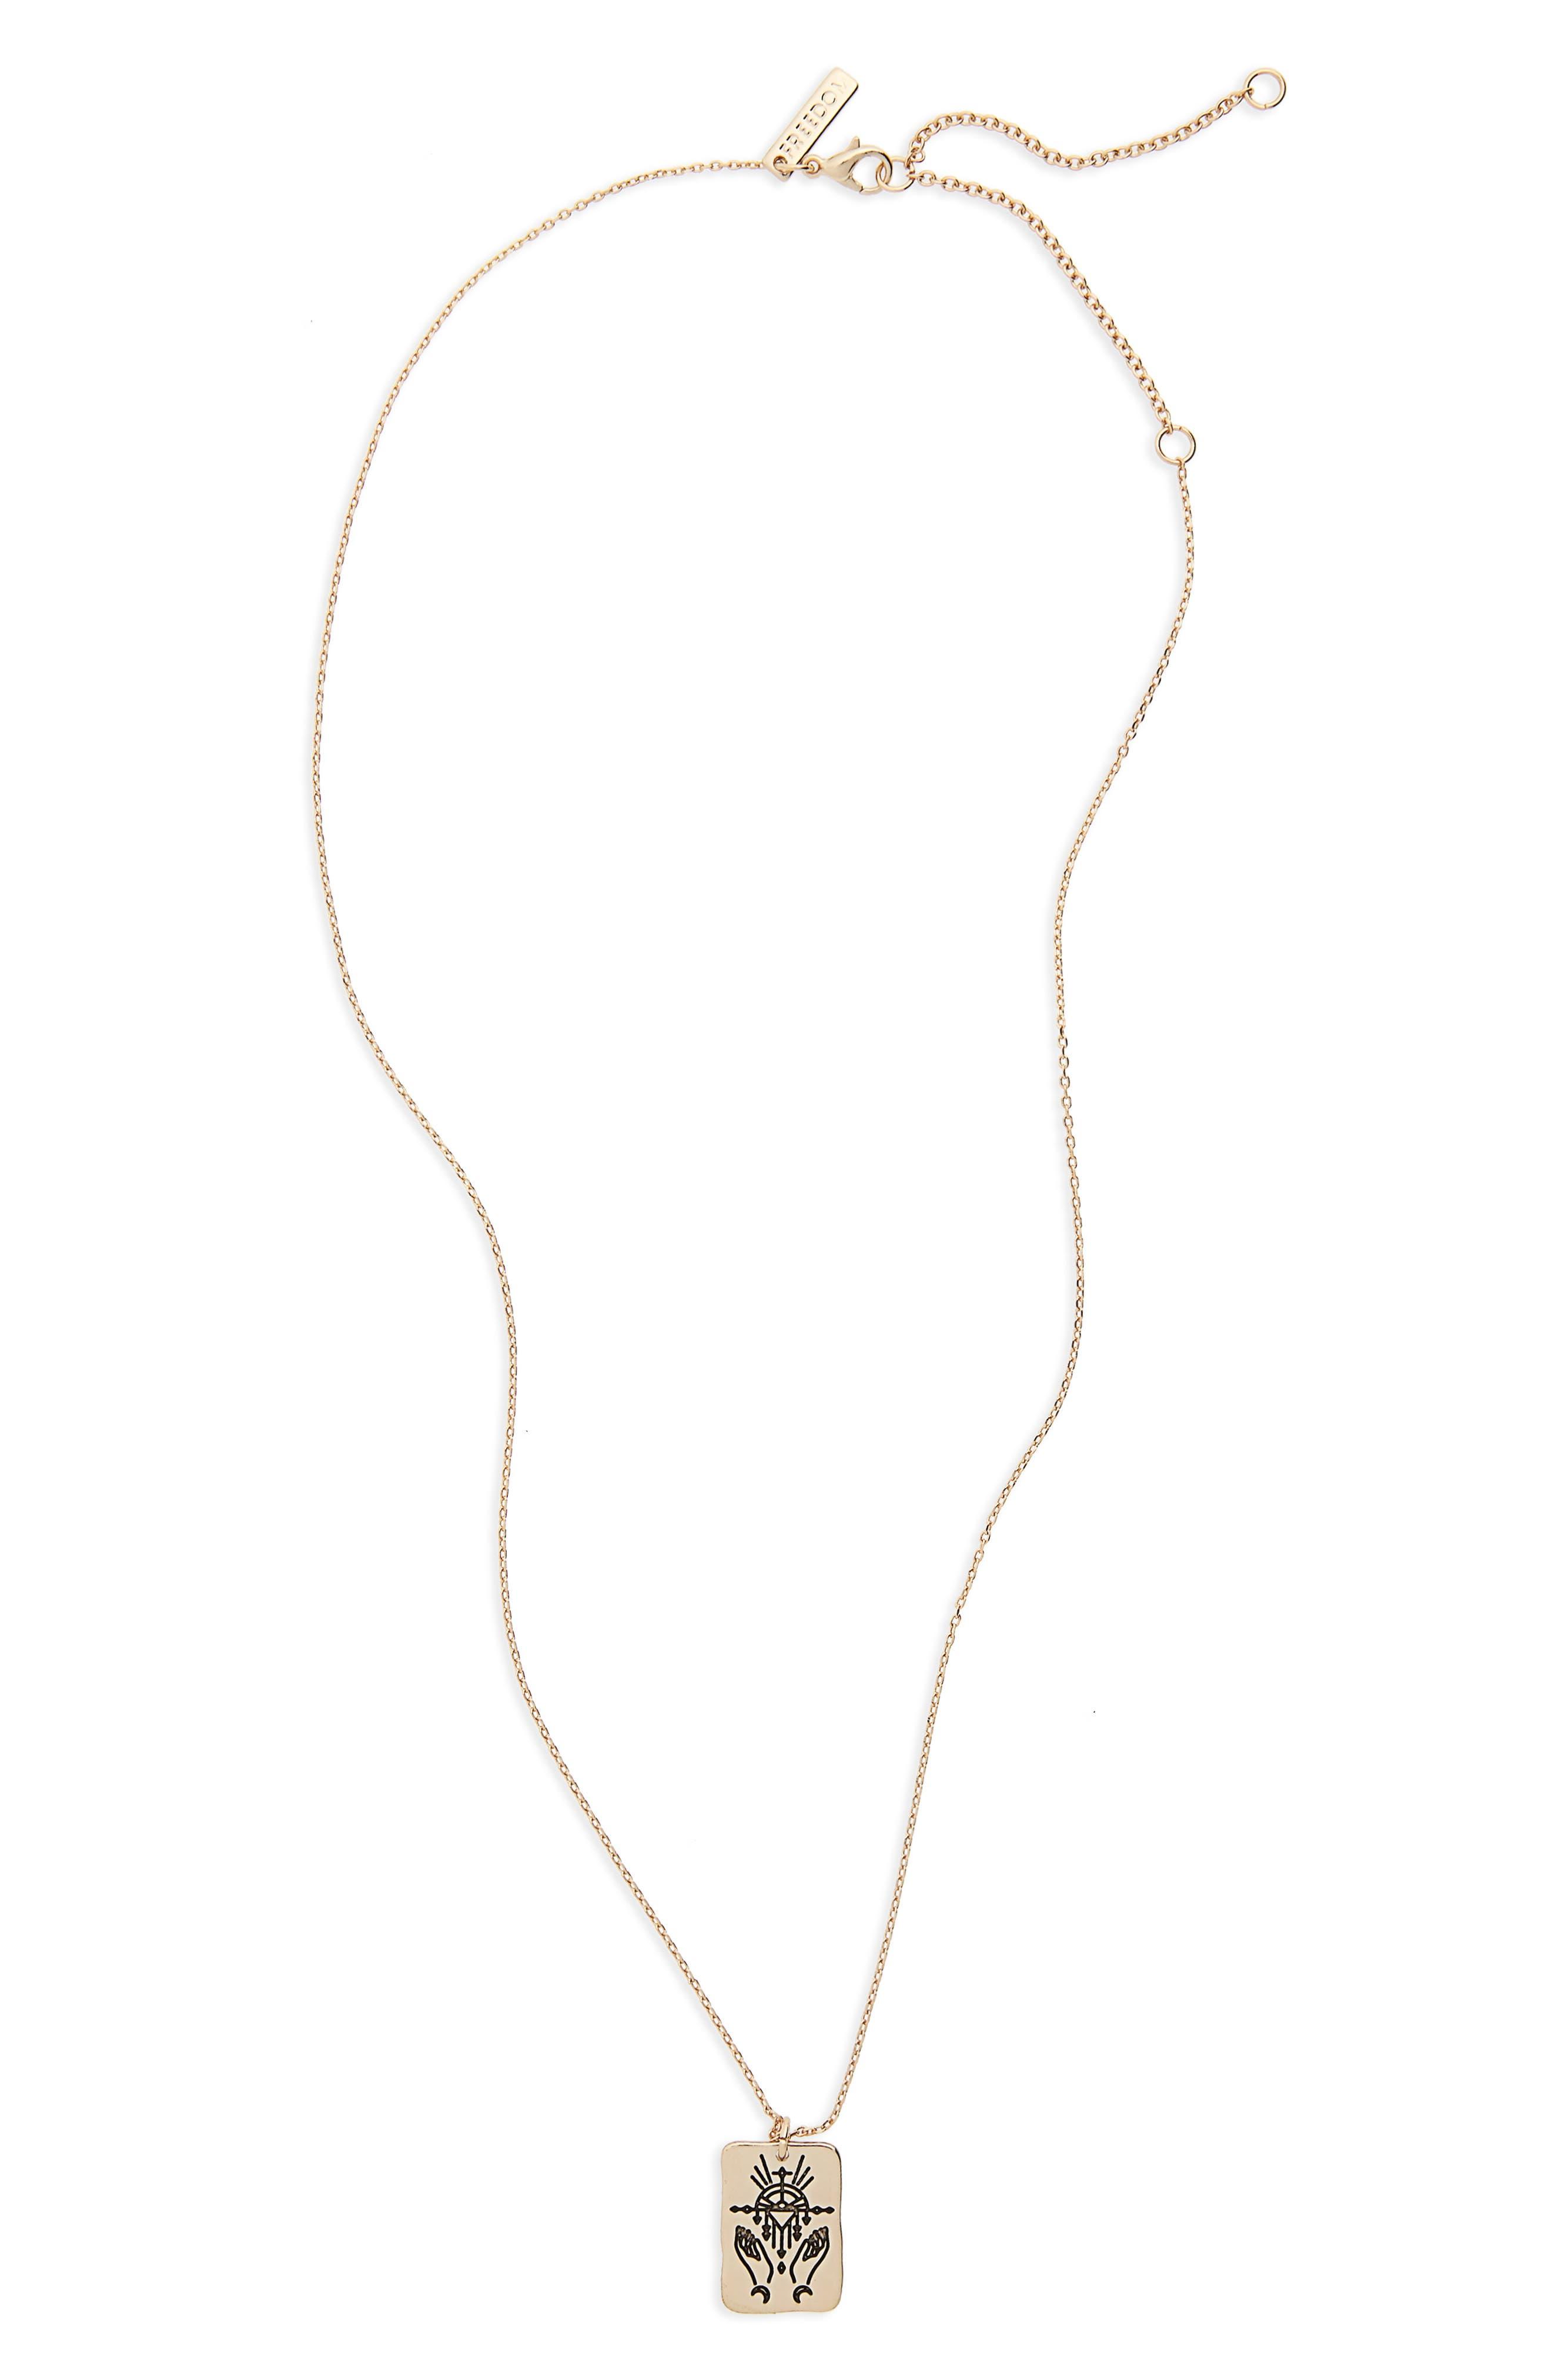 Tarot High Priest Pendant Necklace,                         Main,                         color, Gold